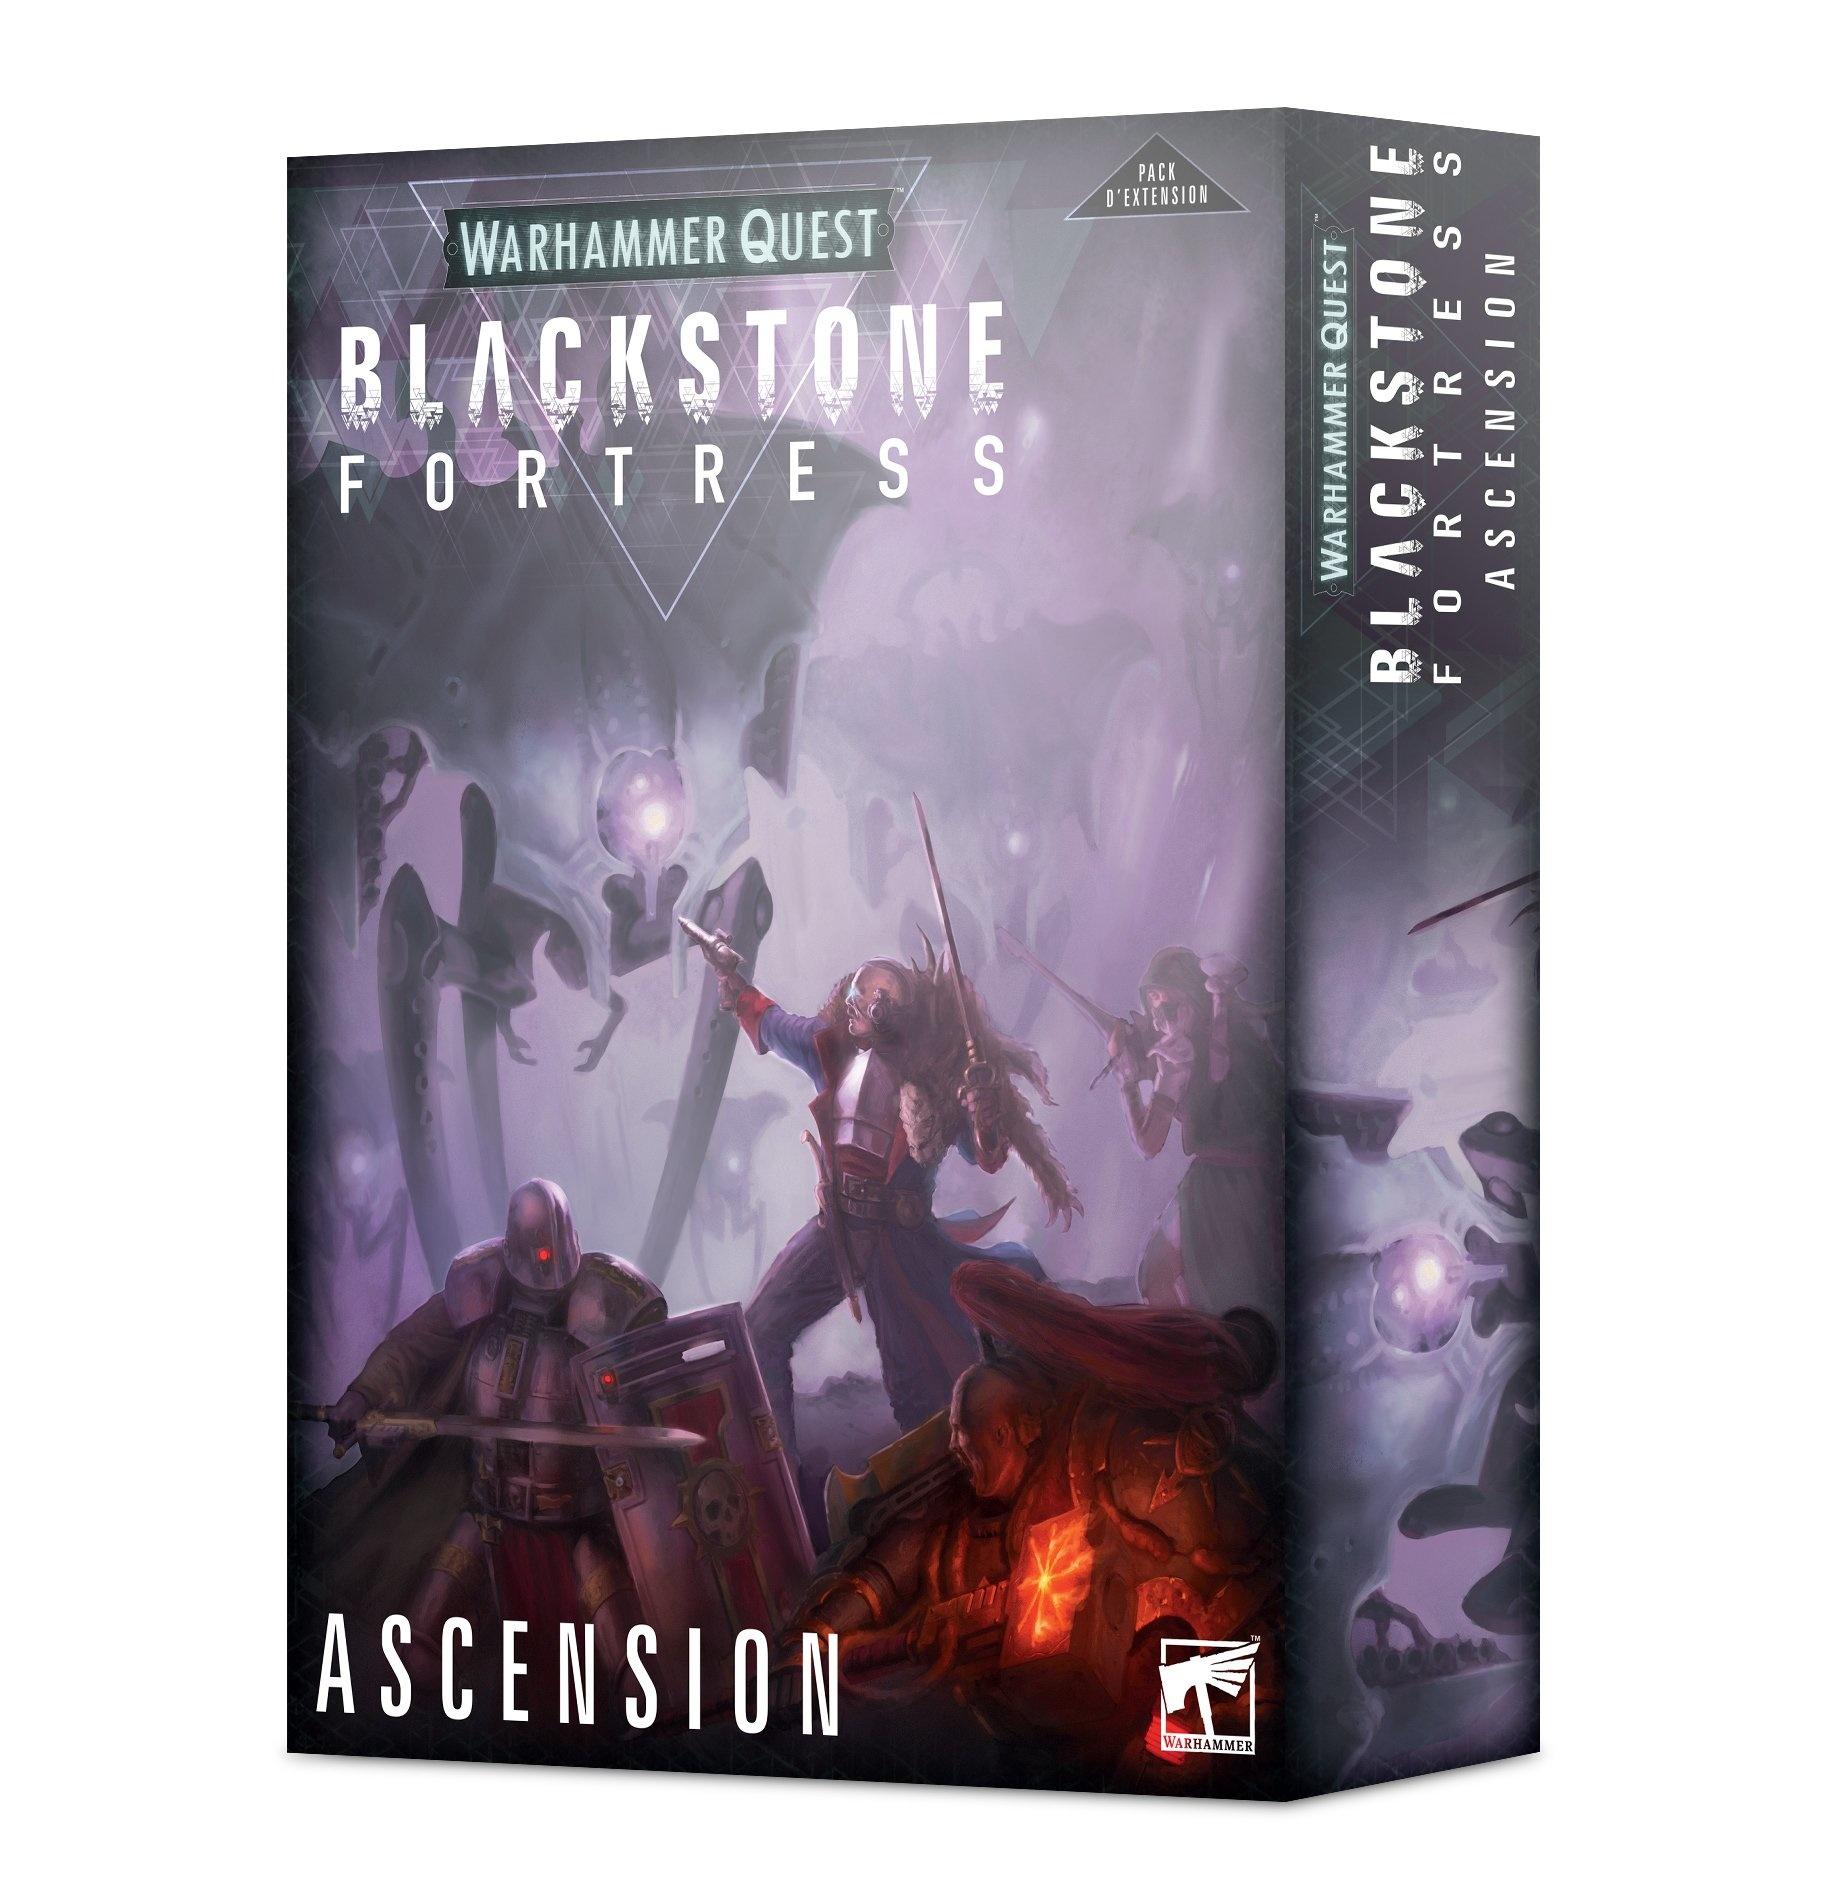 Games-Workshop Warhammer Quest: Blackstone Fortress: Ascension